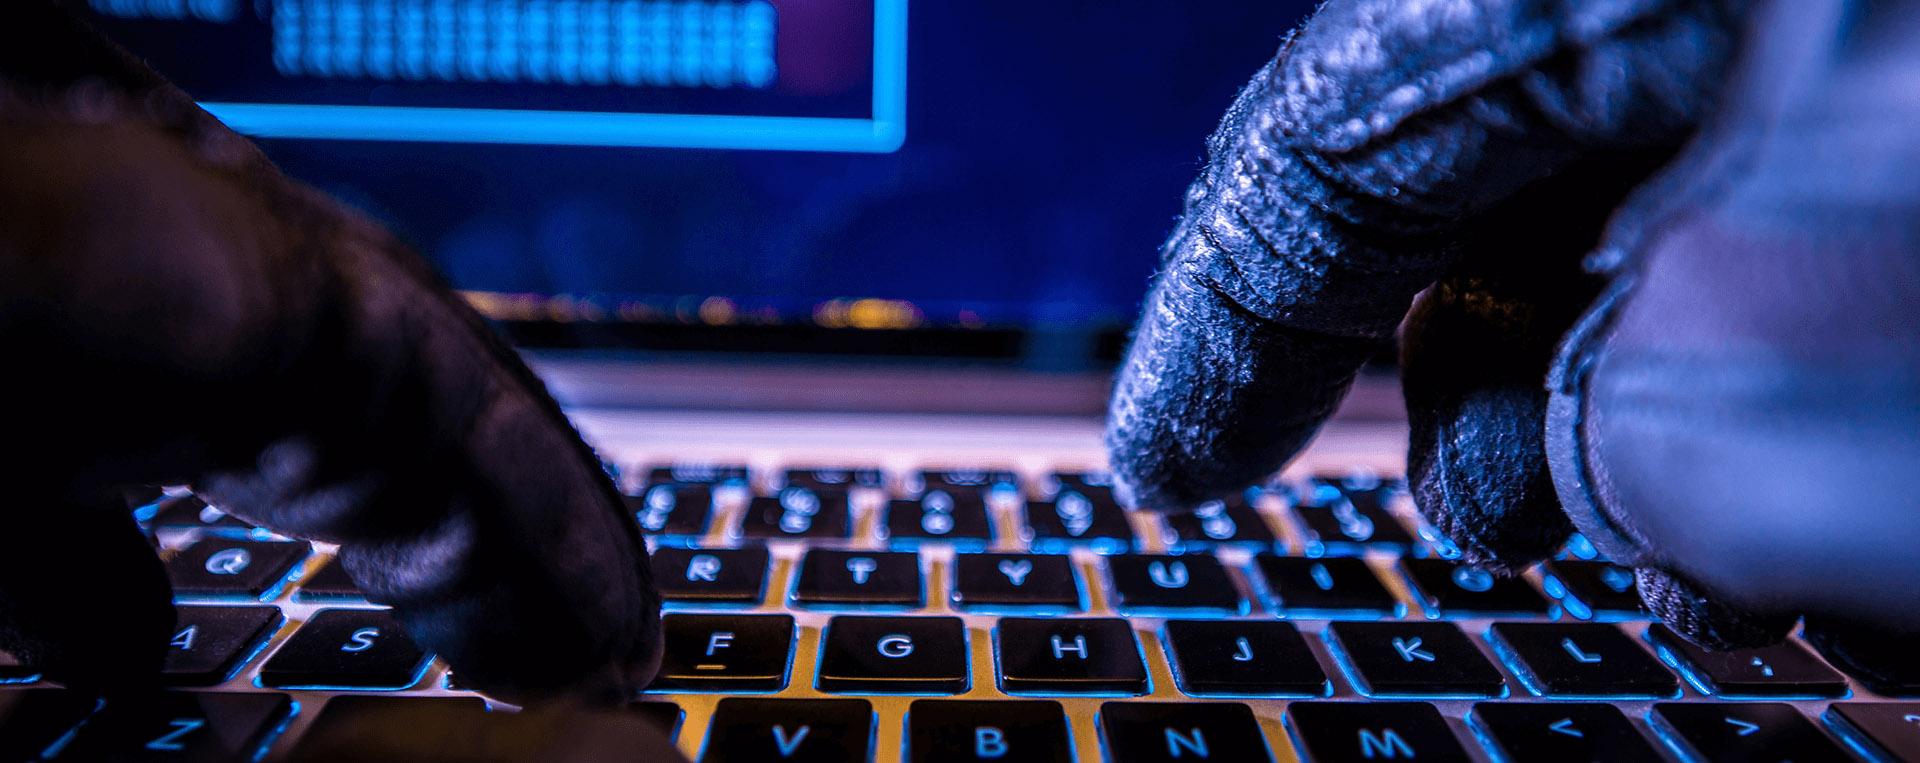 auditoria-web-seguridad-zcohosting